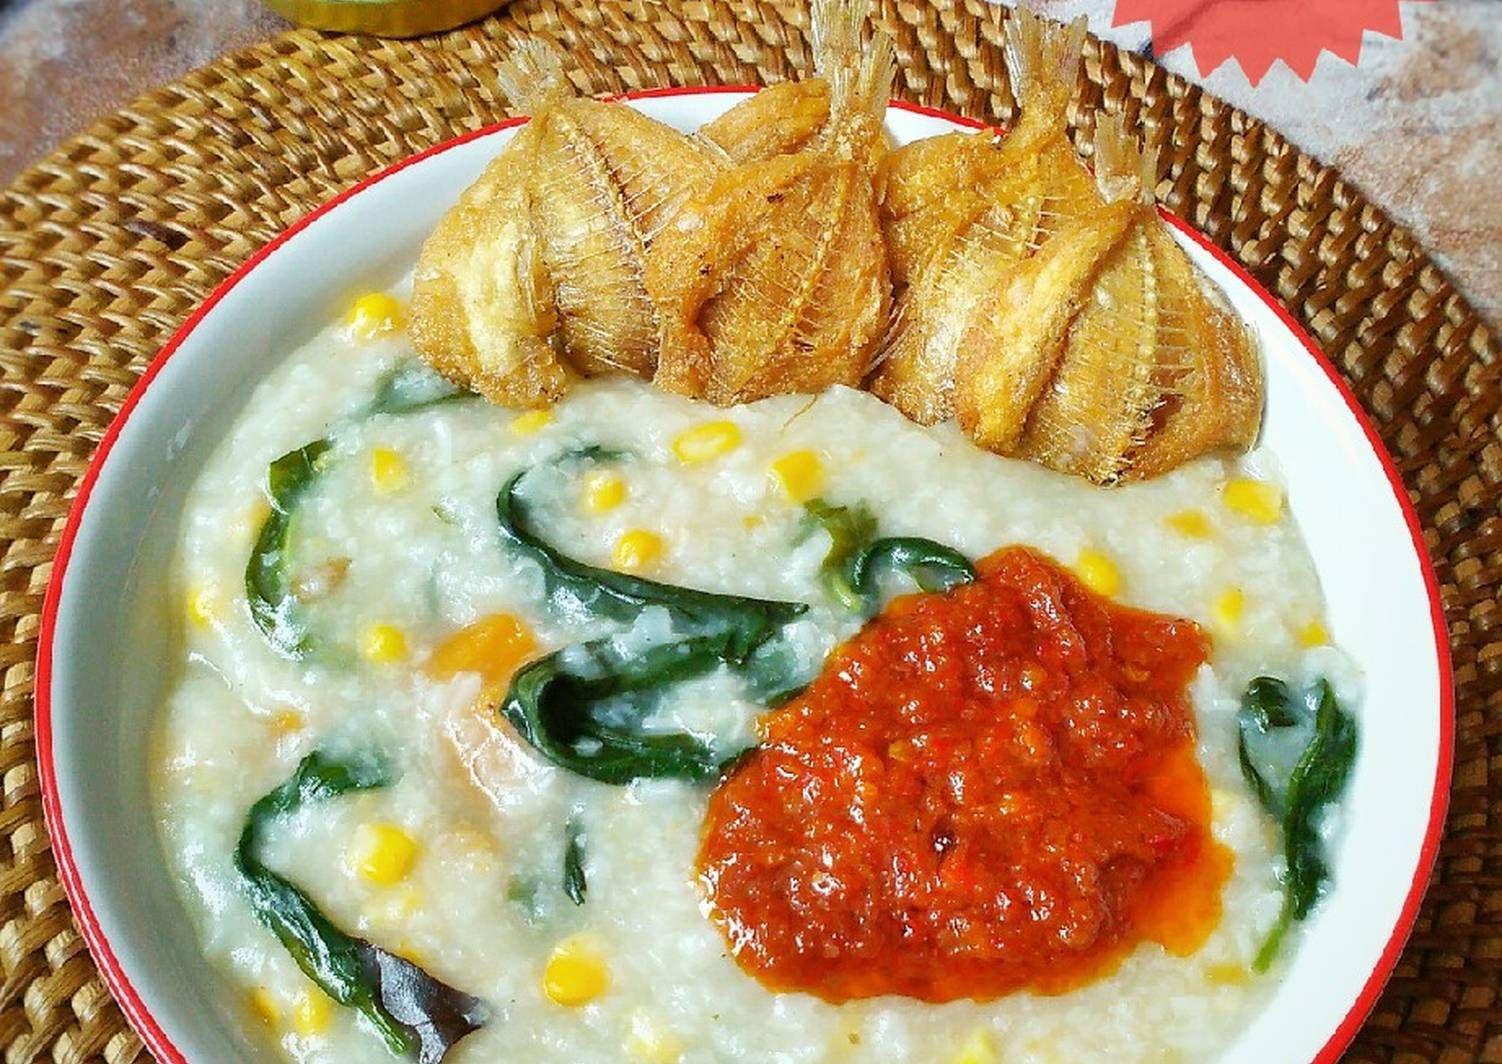 Resep Bubur Manado Tinutuan Oleh Susan Mellyani Resep Resep Makanan Dan Minuman Makanan